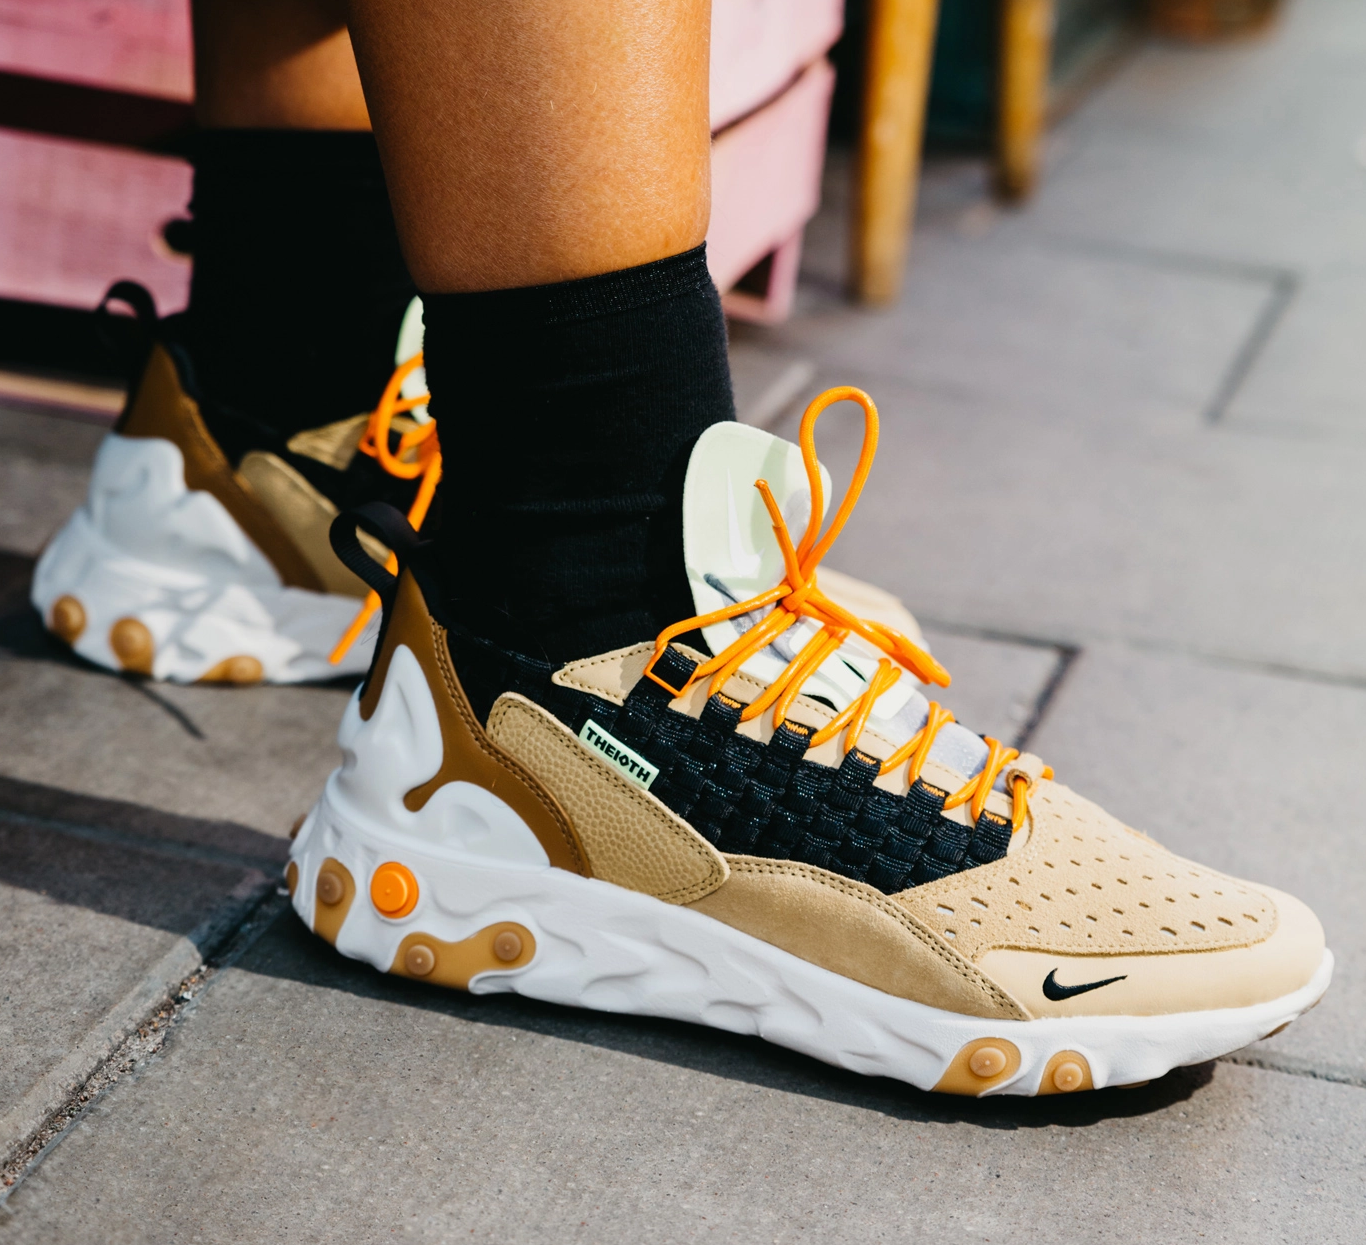 The Nike React Sertu Runner